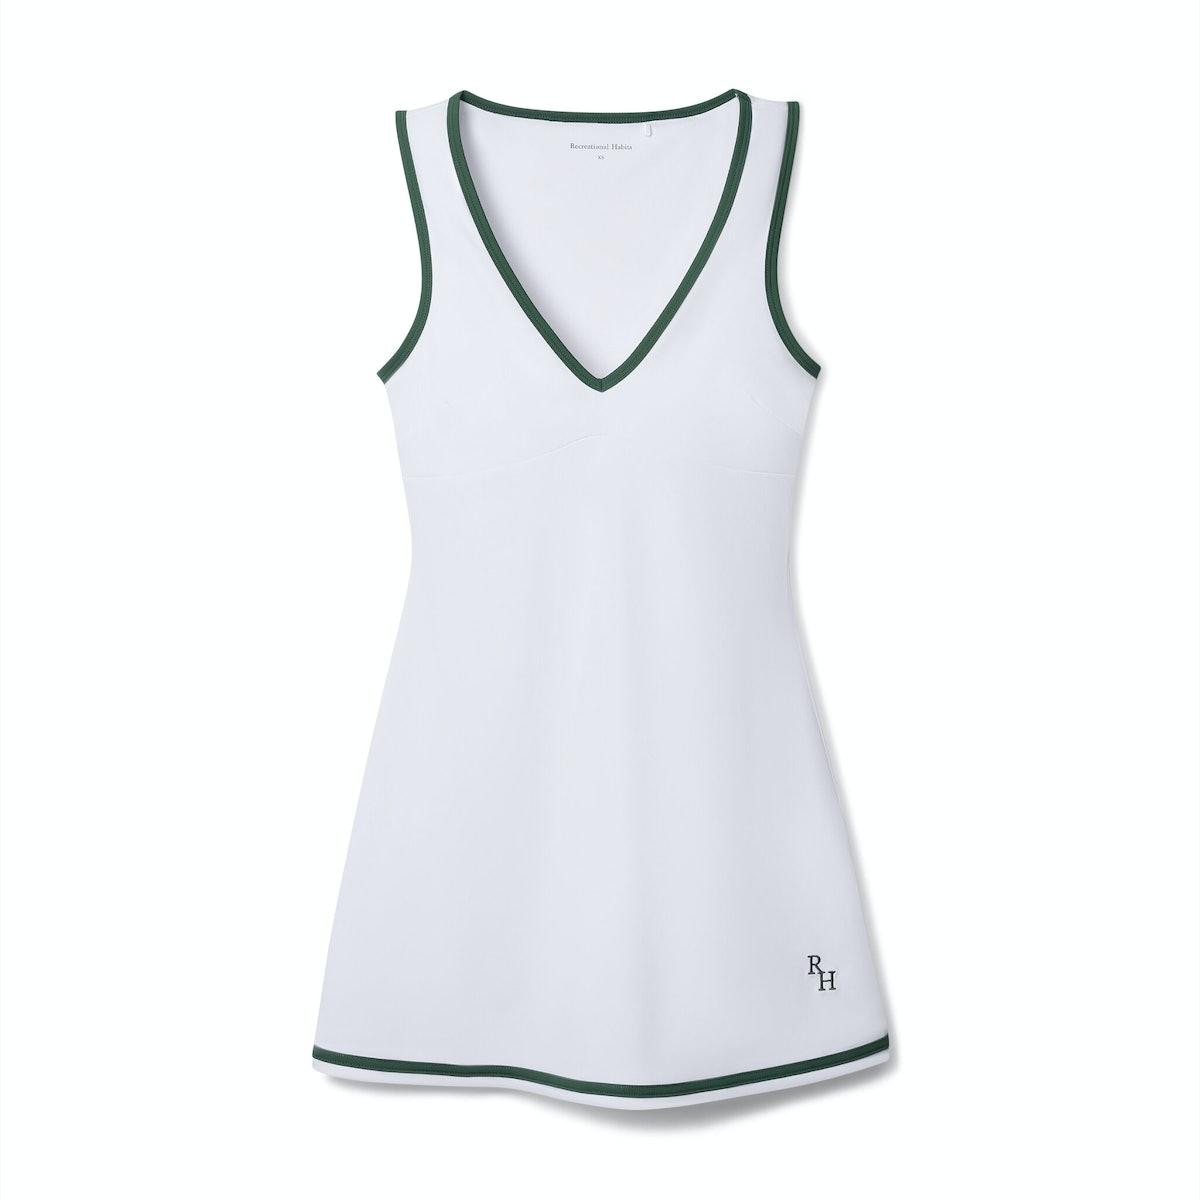 Recreational Habits Tennis Dress